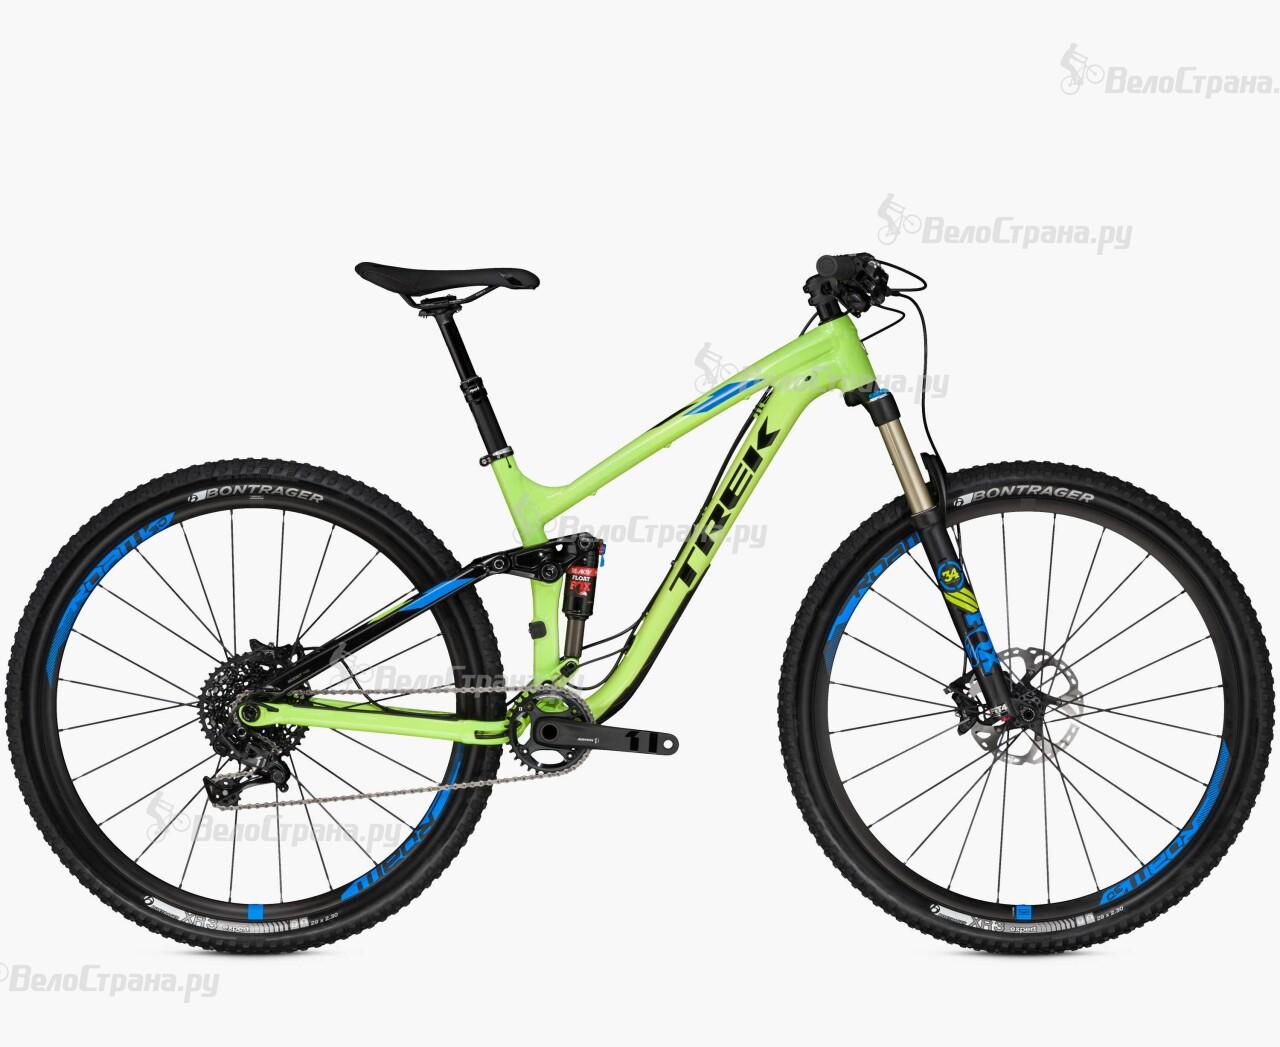 Велосипед Trek Fuel EX 9 29 (2016) велосипед trek fuel ex 9 29 2017